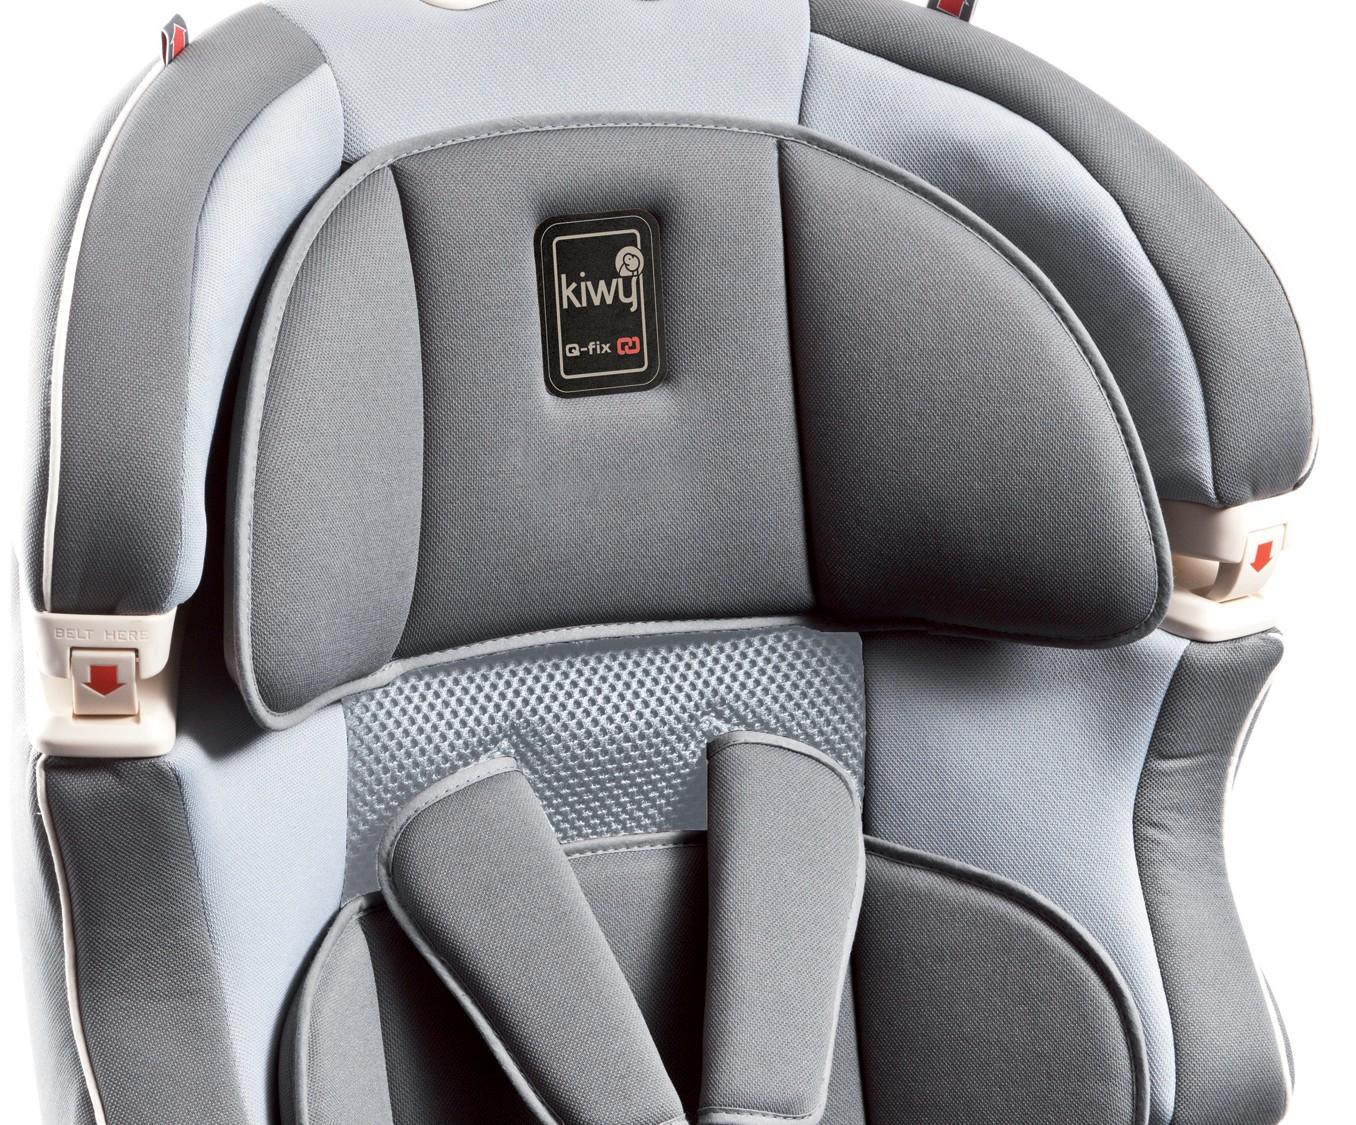 babytop24 kiwy autositz slf123 mit q fix adapter f r isofix stone. Black Bedroom Furniture Sets. Home Design Ideas